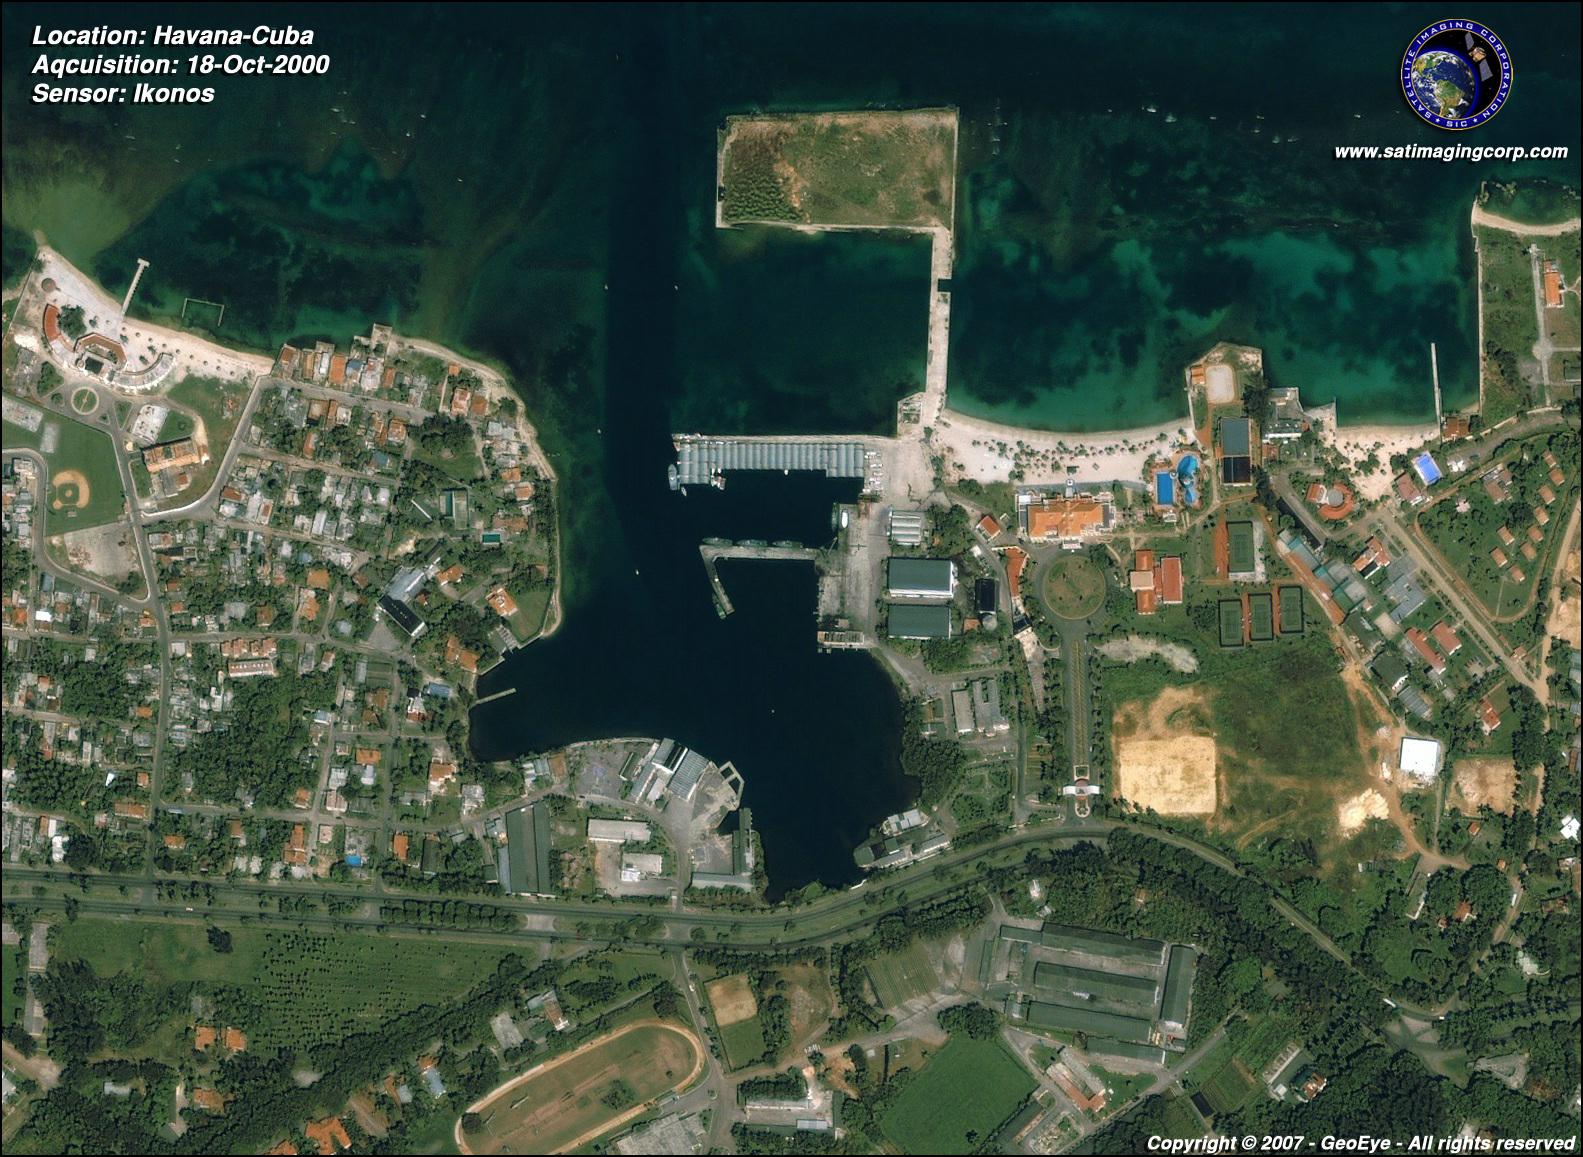 Ikonos Satellite Image Of Havana Cuba Satellite Imaging